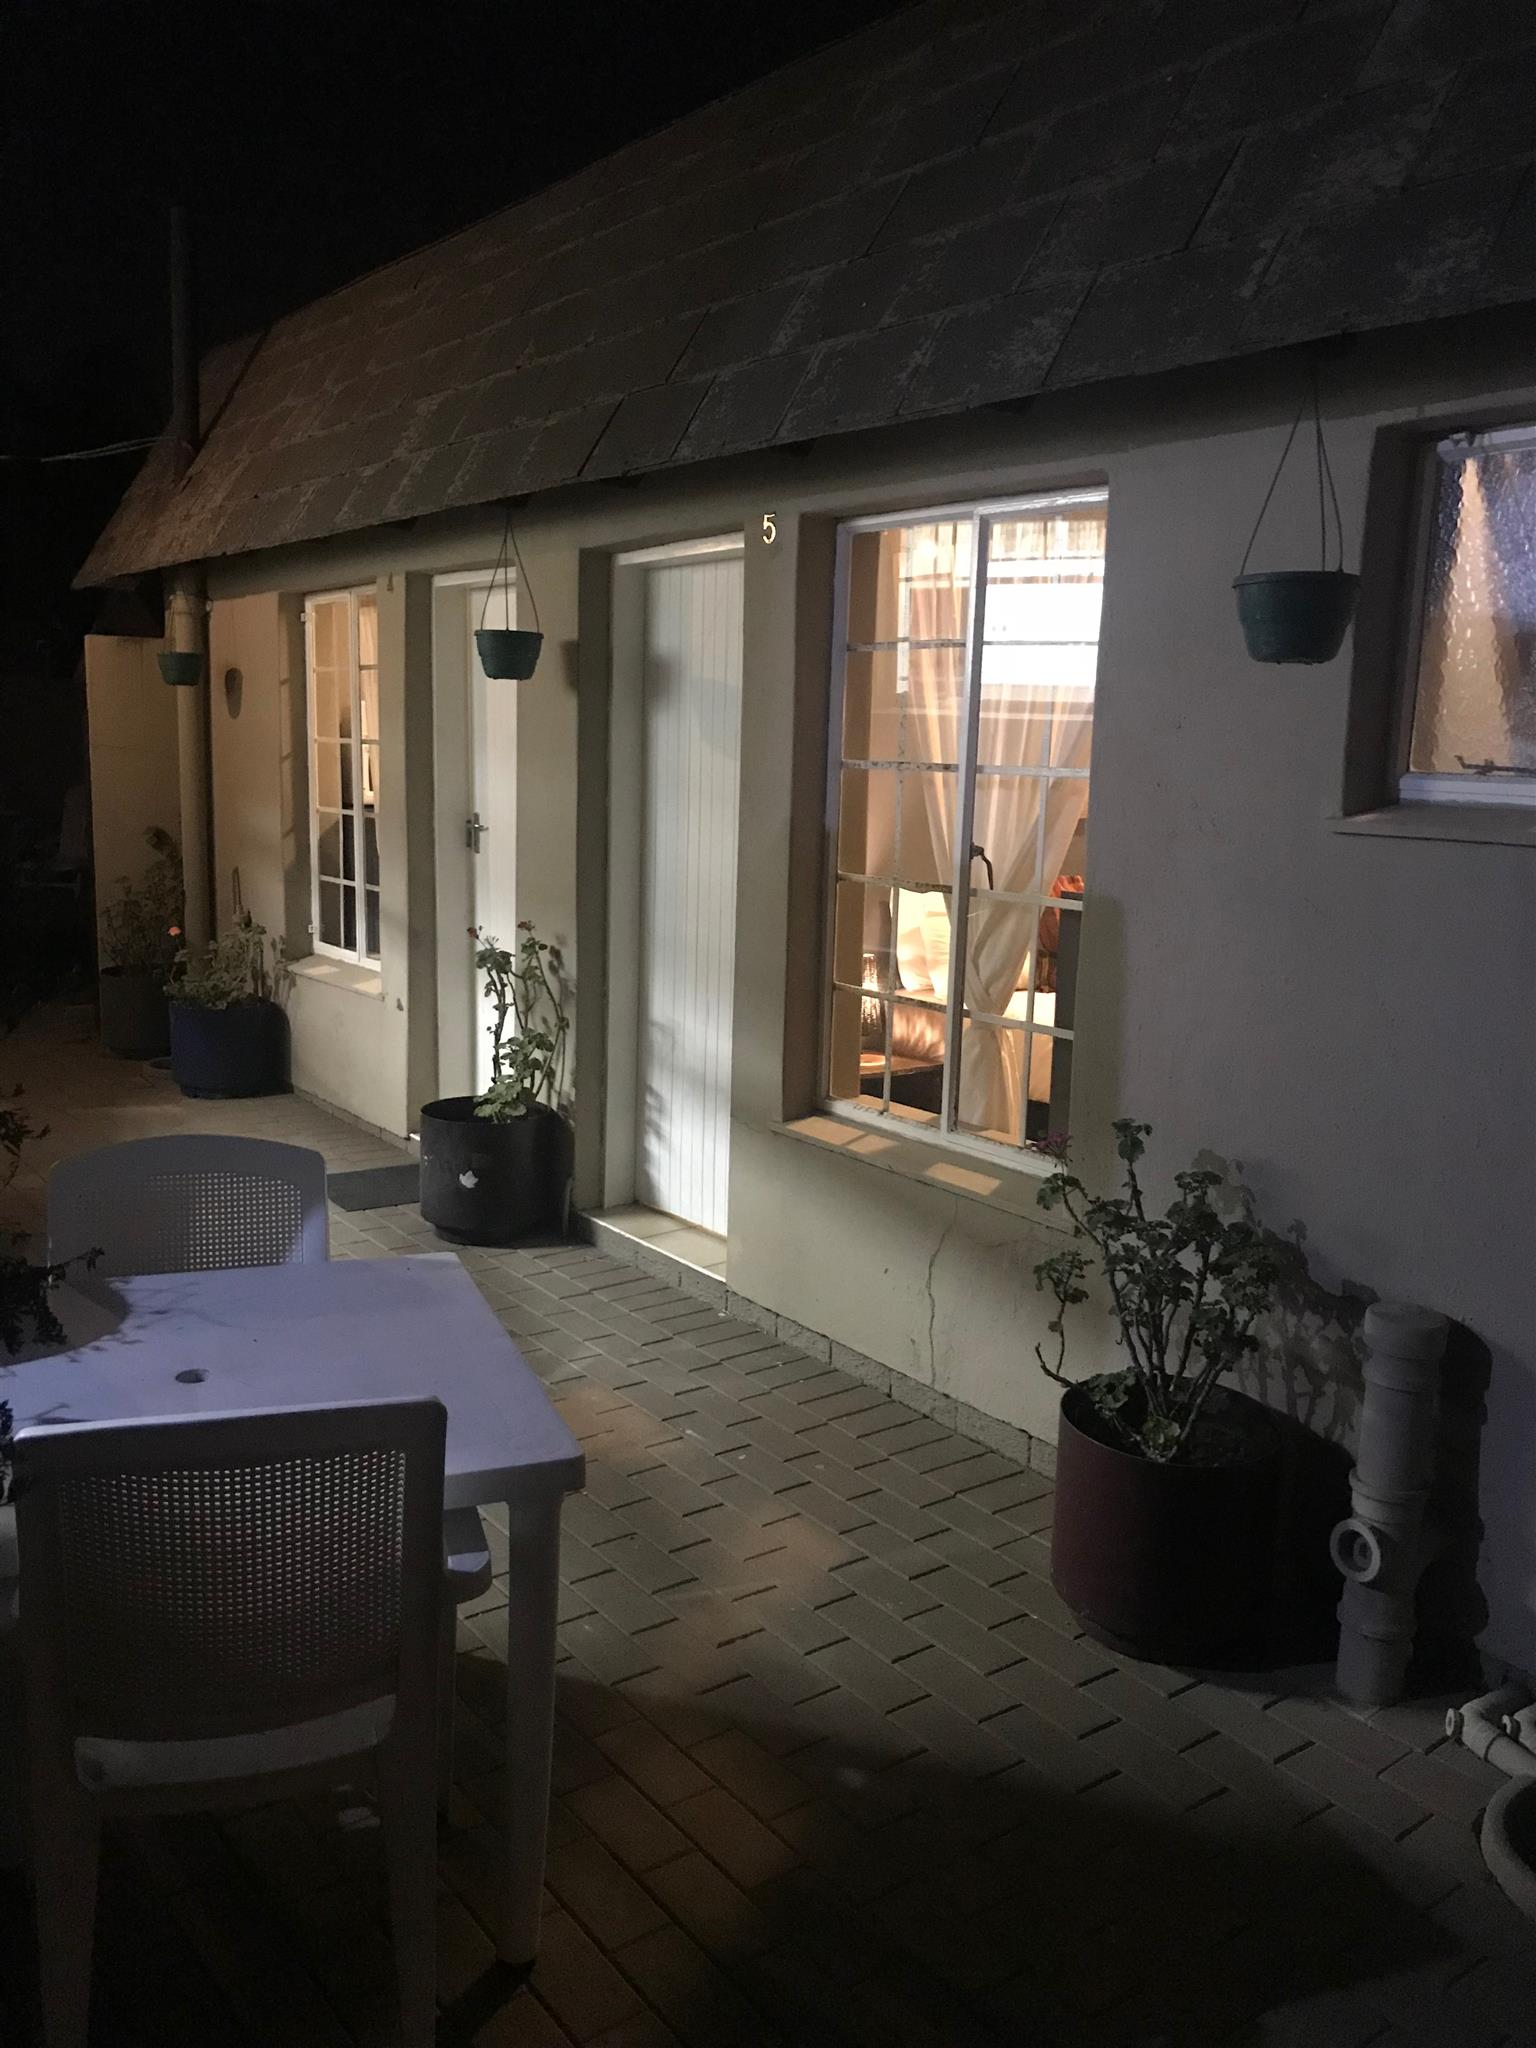 Garden room furnished, Birchleigh KemptonPark